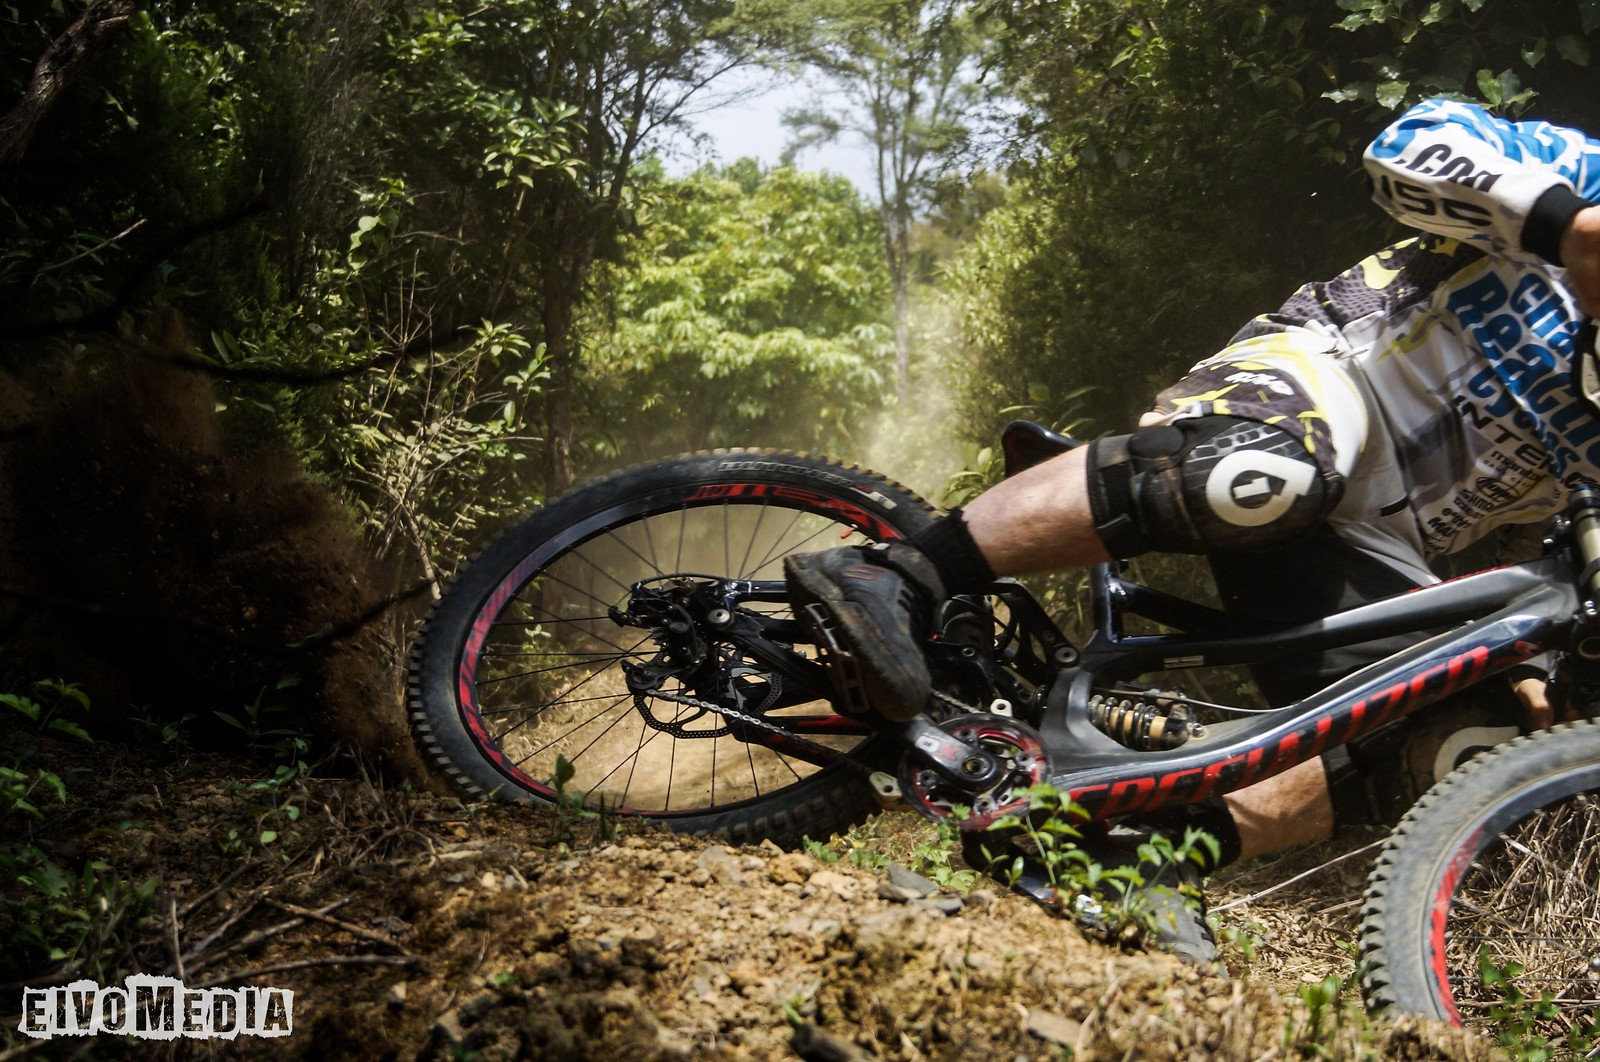 Hunua DH-10 - EIVOMEDIA - Mountain Biking Pictures - Vital MTB